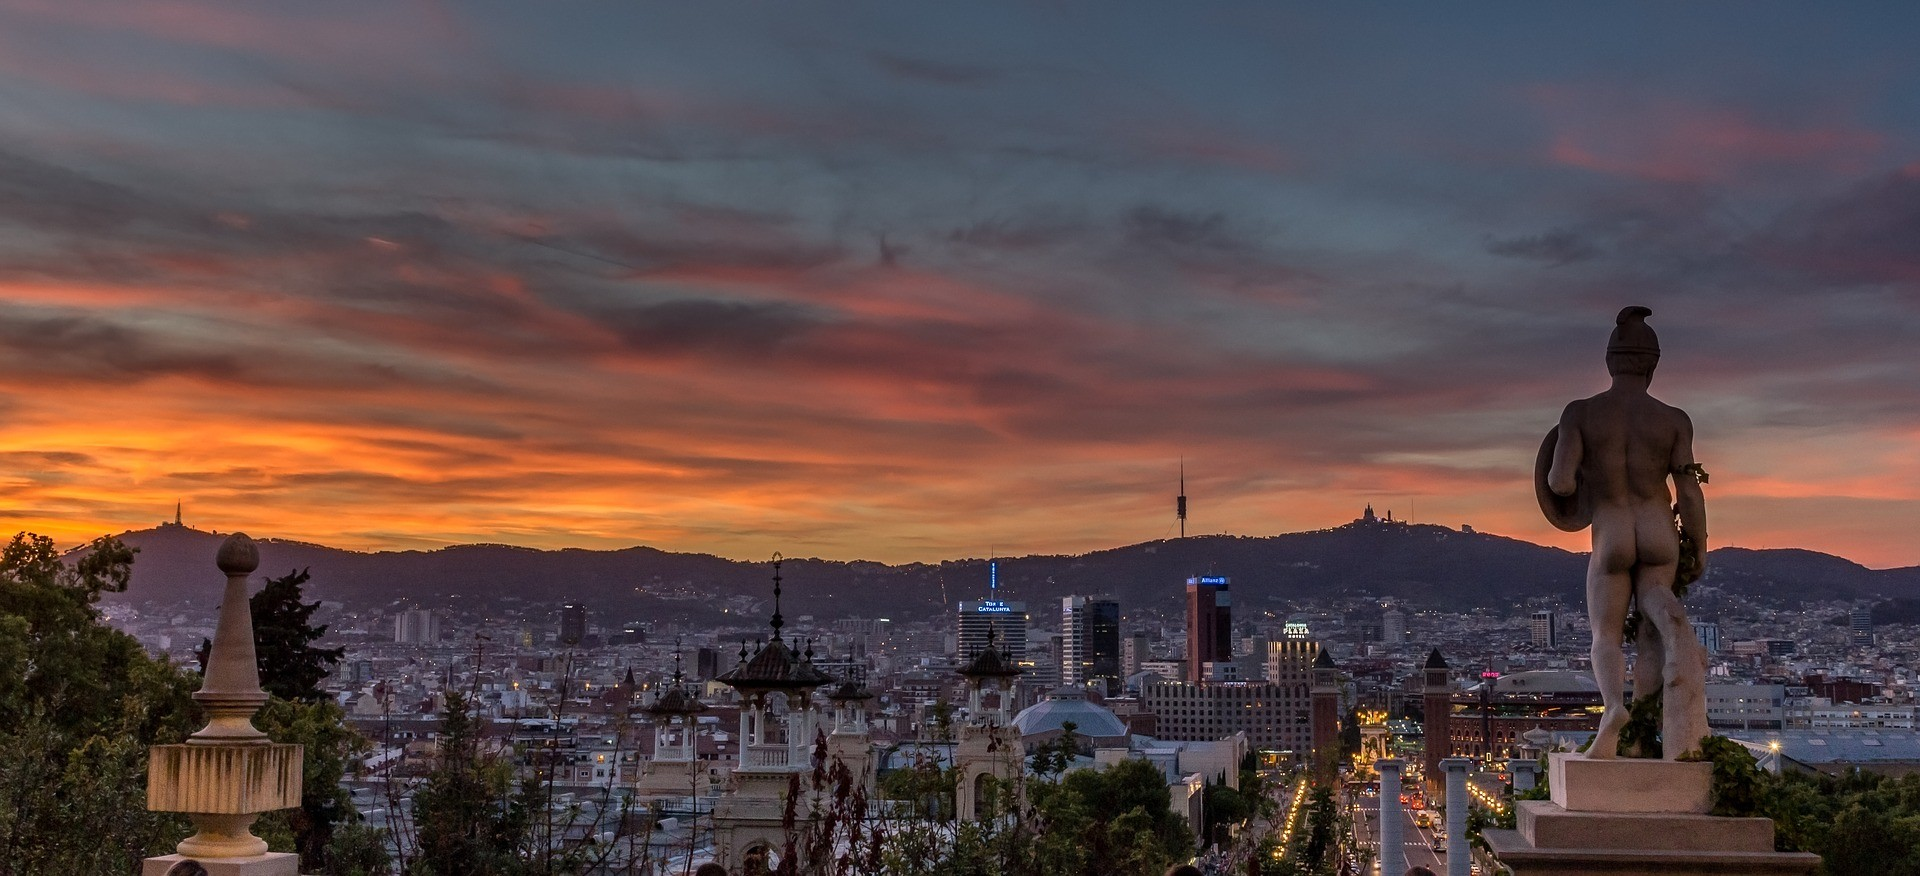 barcelona-7-lugares-imprescindibles-8b3f